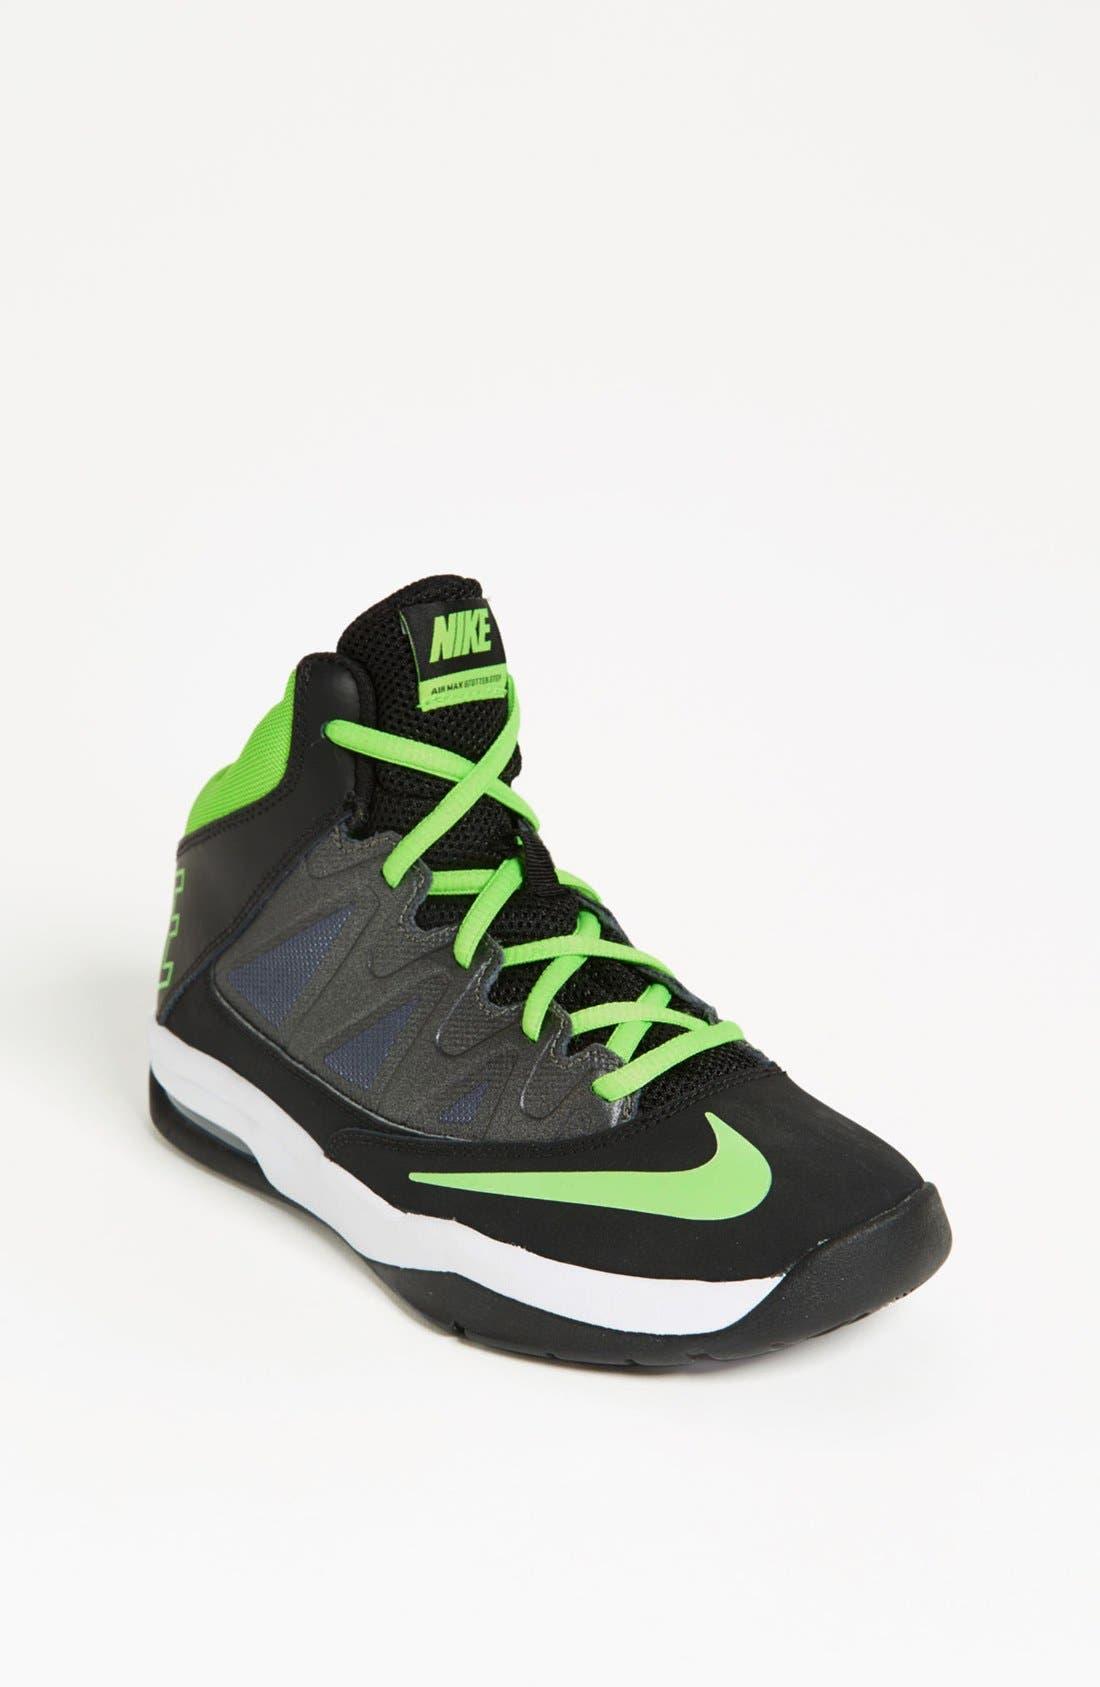 Main Image - Nike 'Air Max Stutter Step' Basketball Shoe (Big Kid)